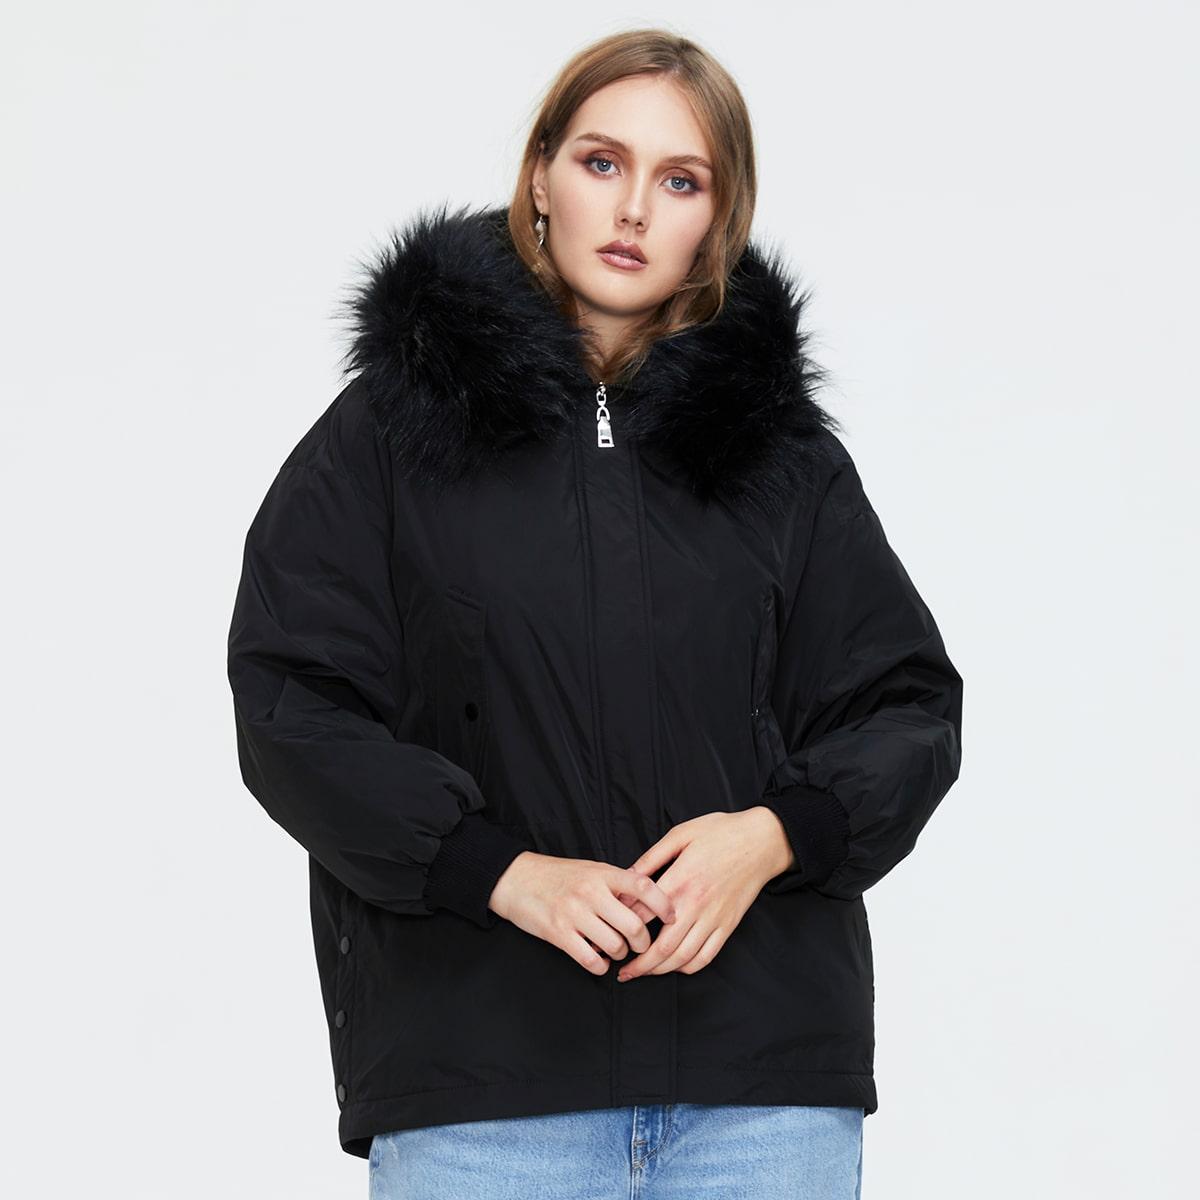 Plus Drawstring Waist Parka Winter Coats